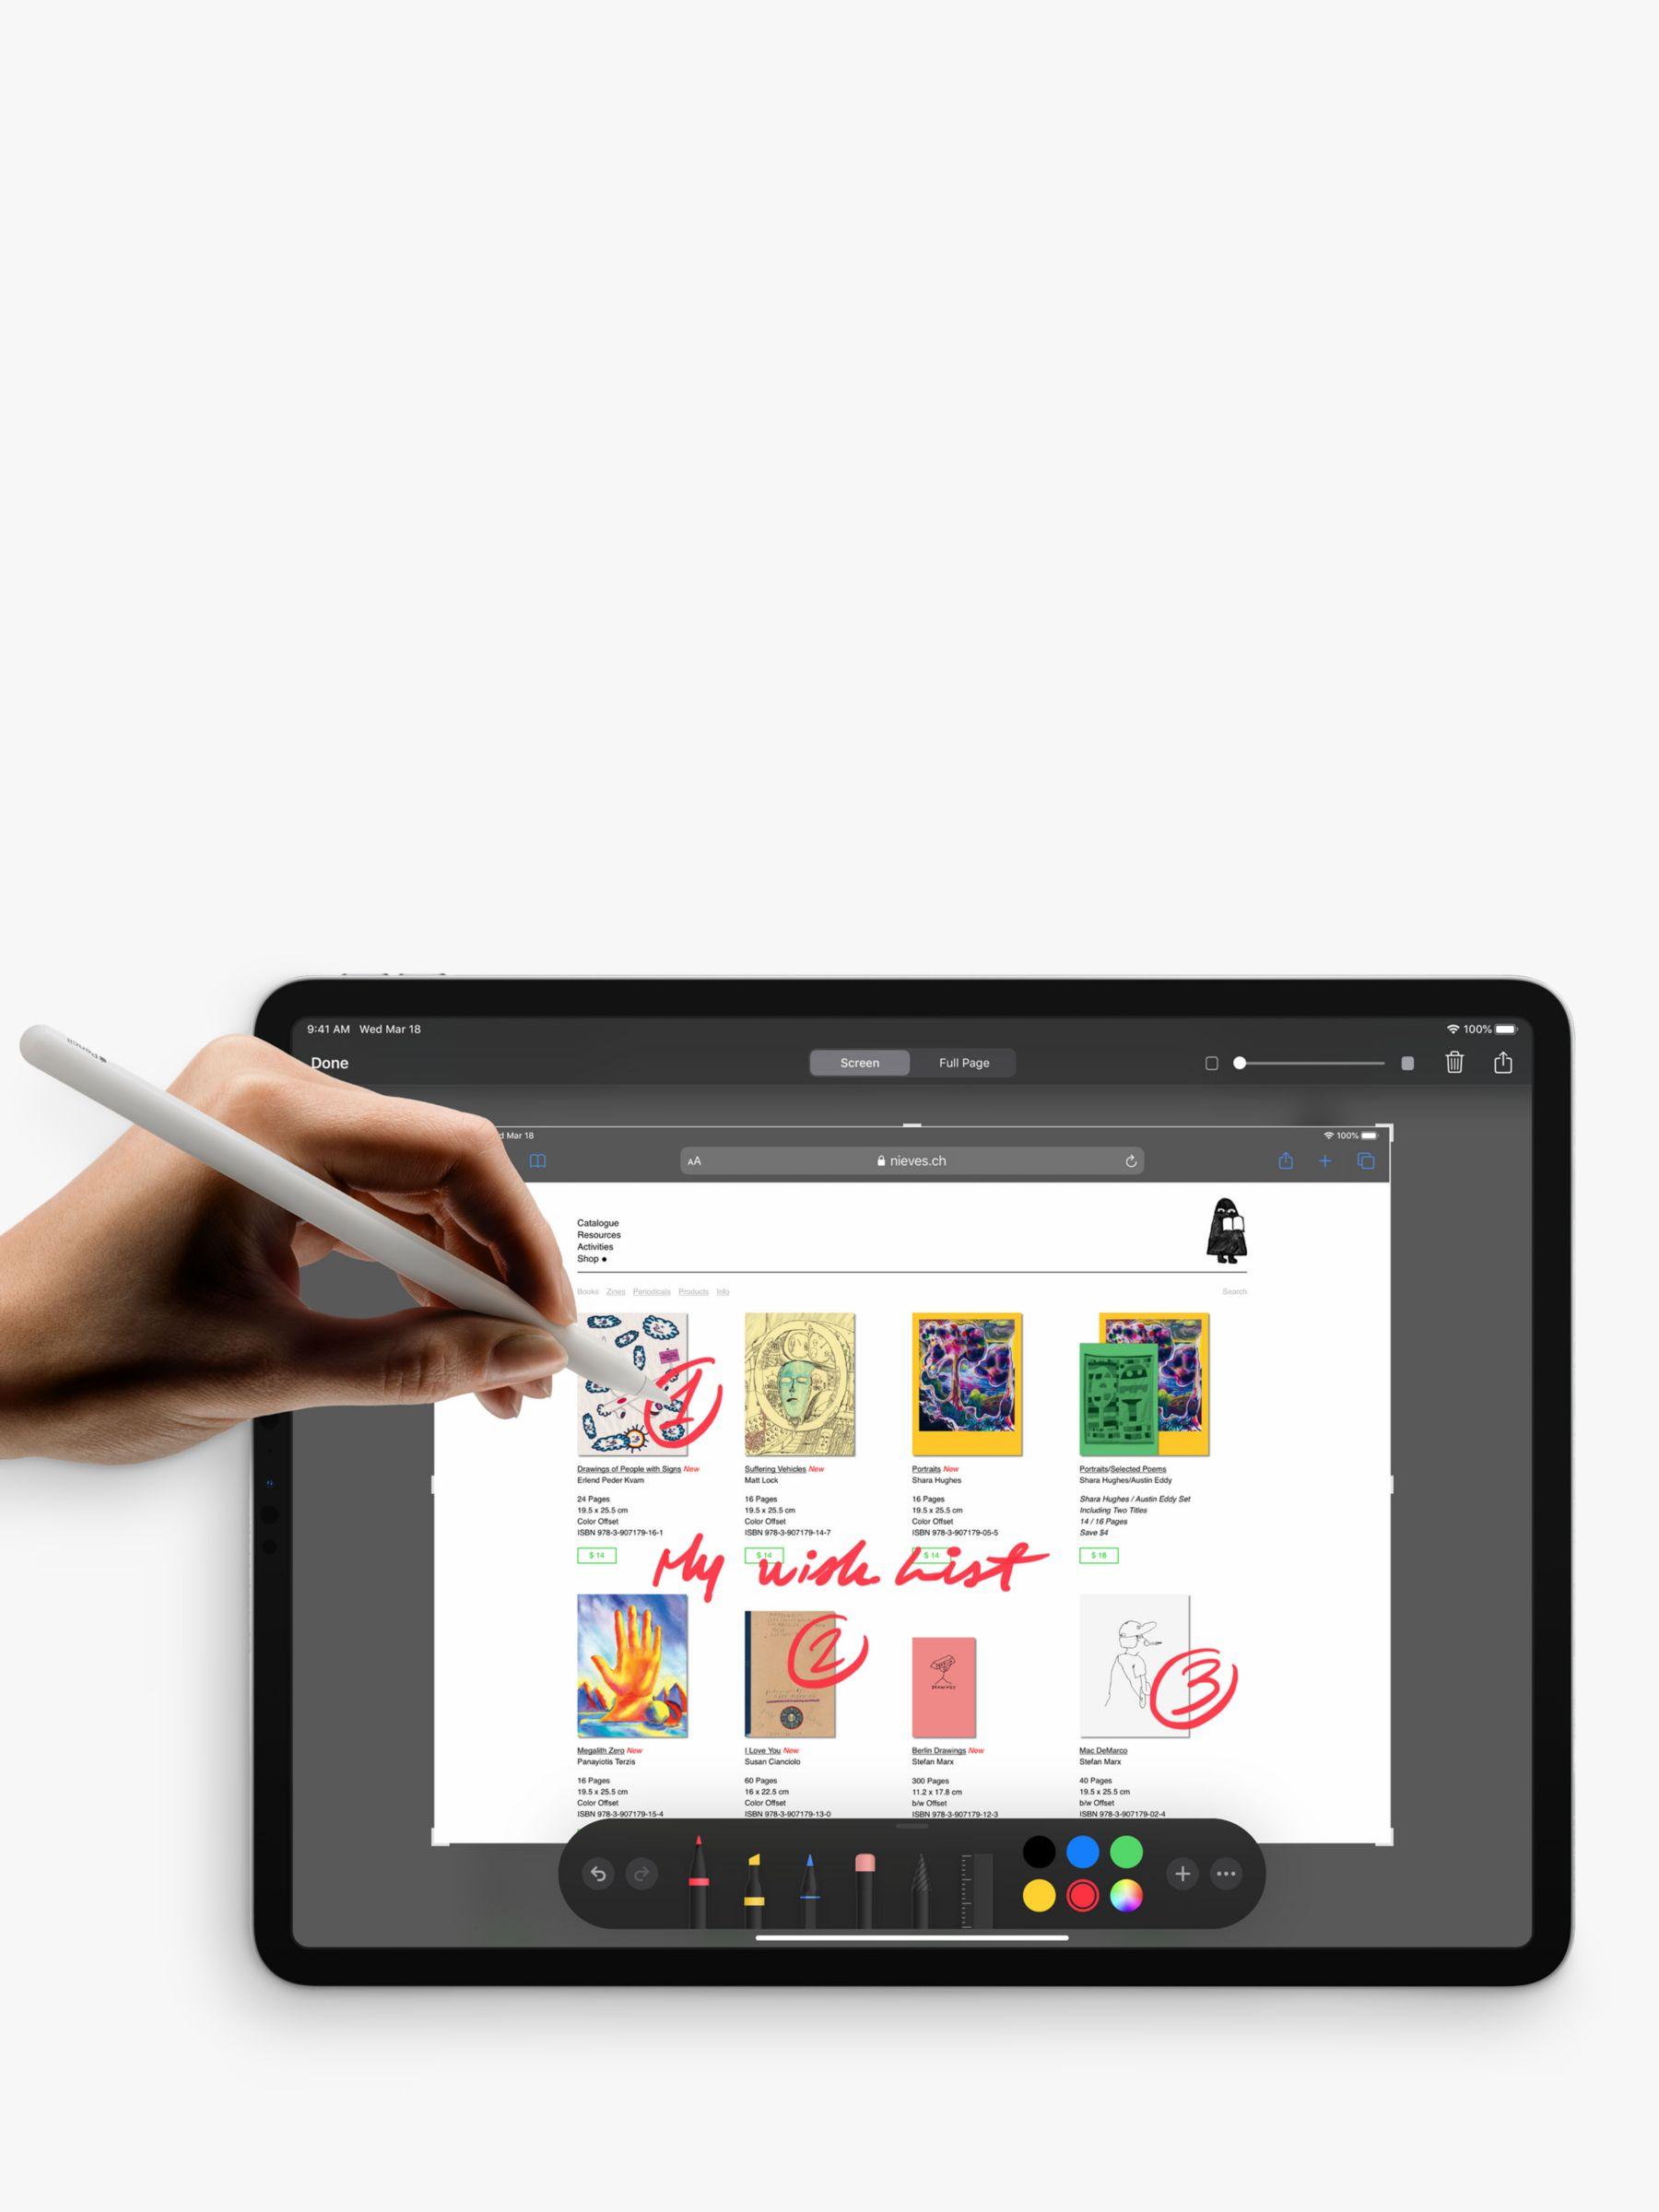 2020 Apple Ipad Pro 12 9 A12z Bionic Ios Wi Fi 128gb At John Lewis Partners